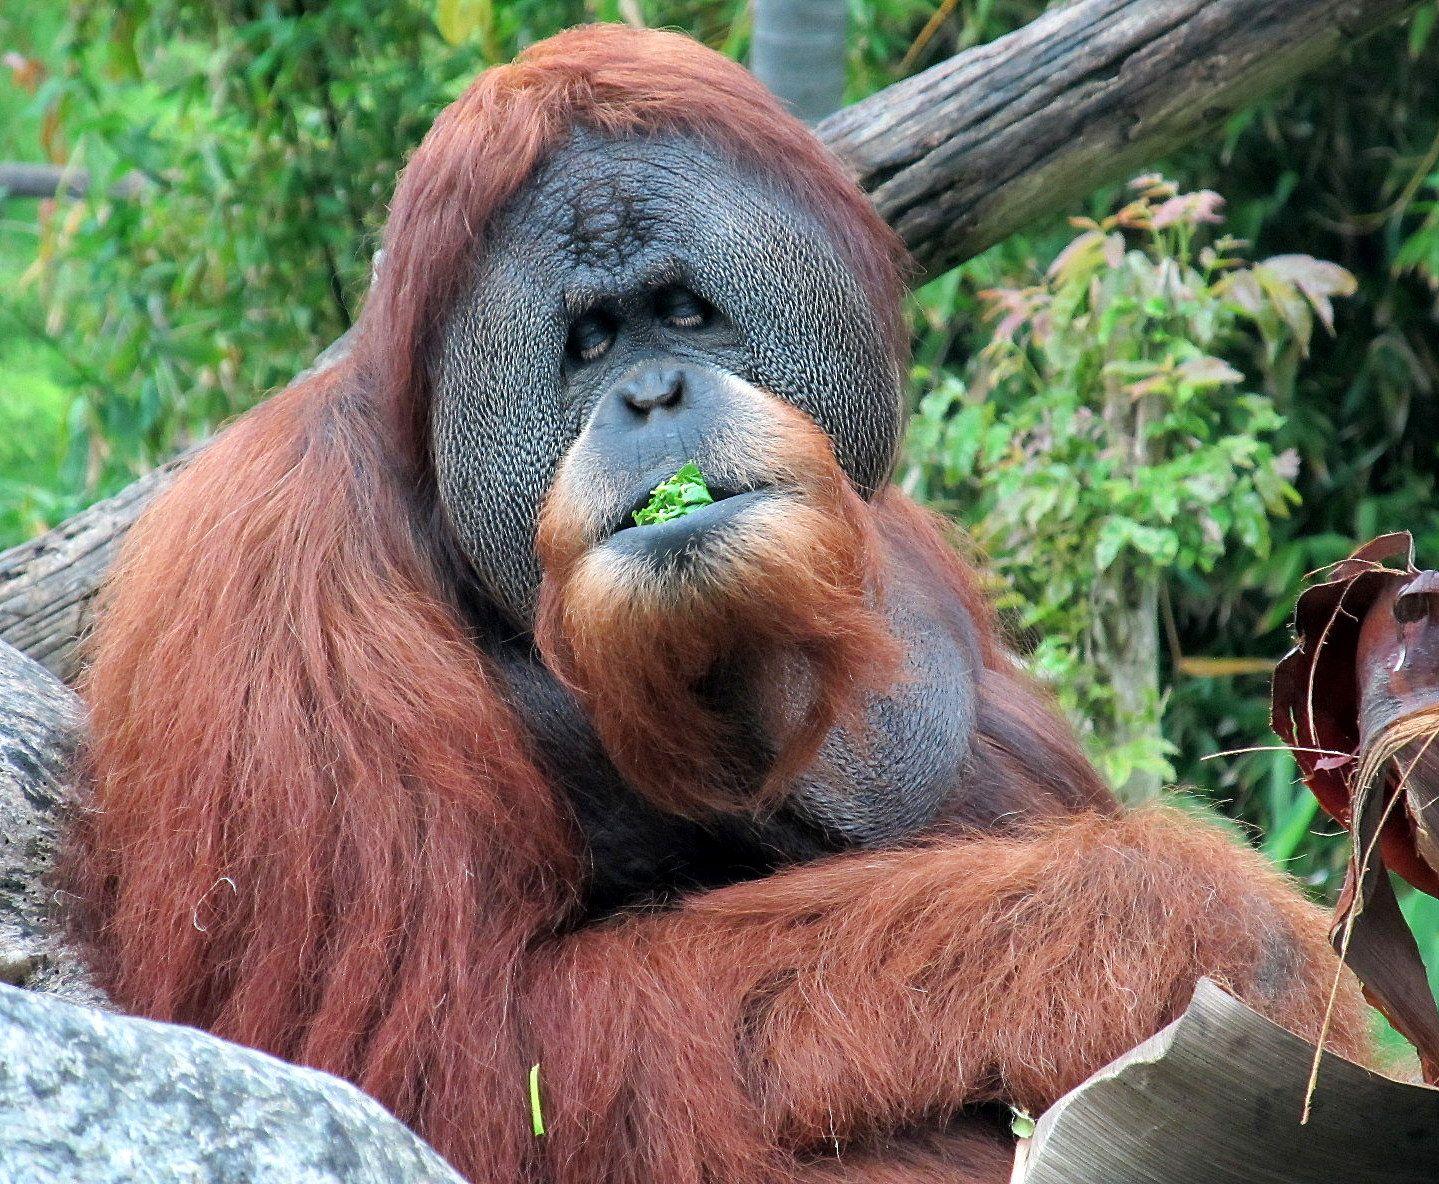 Adult gorillas live alone